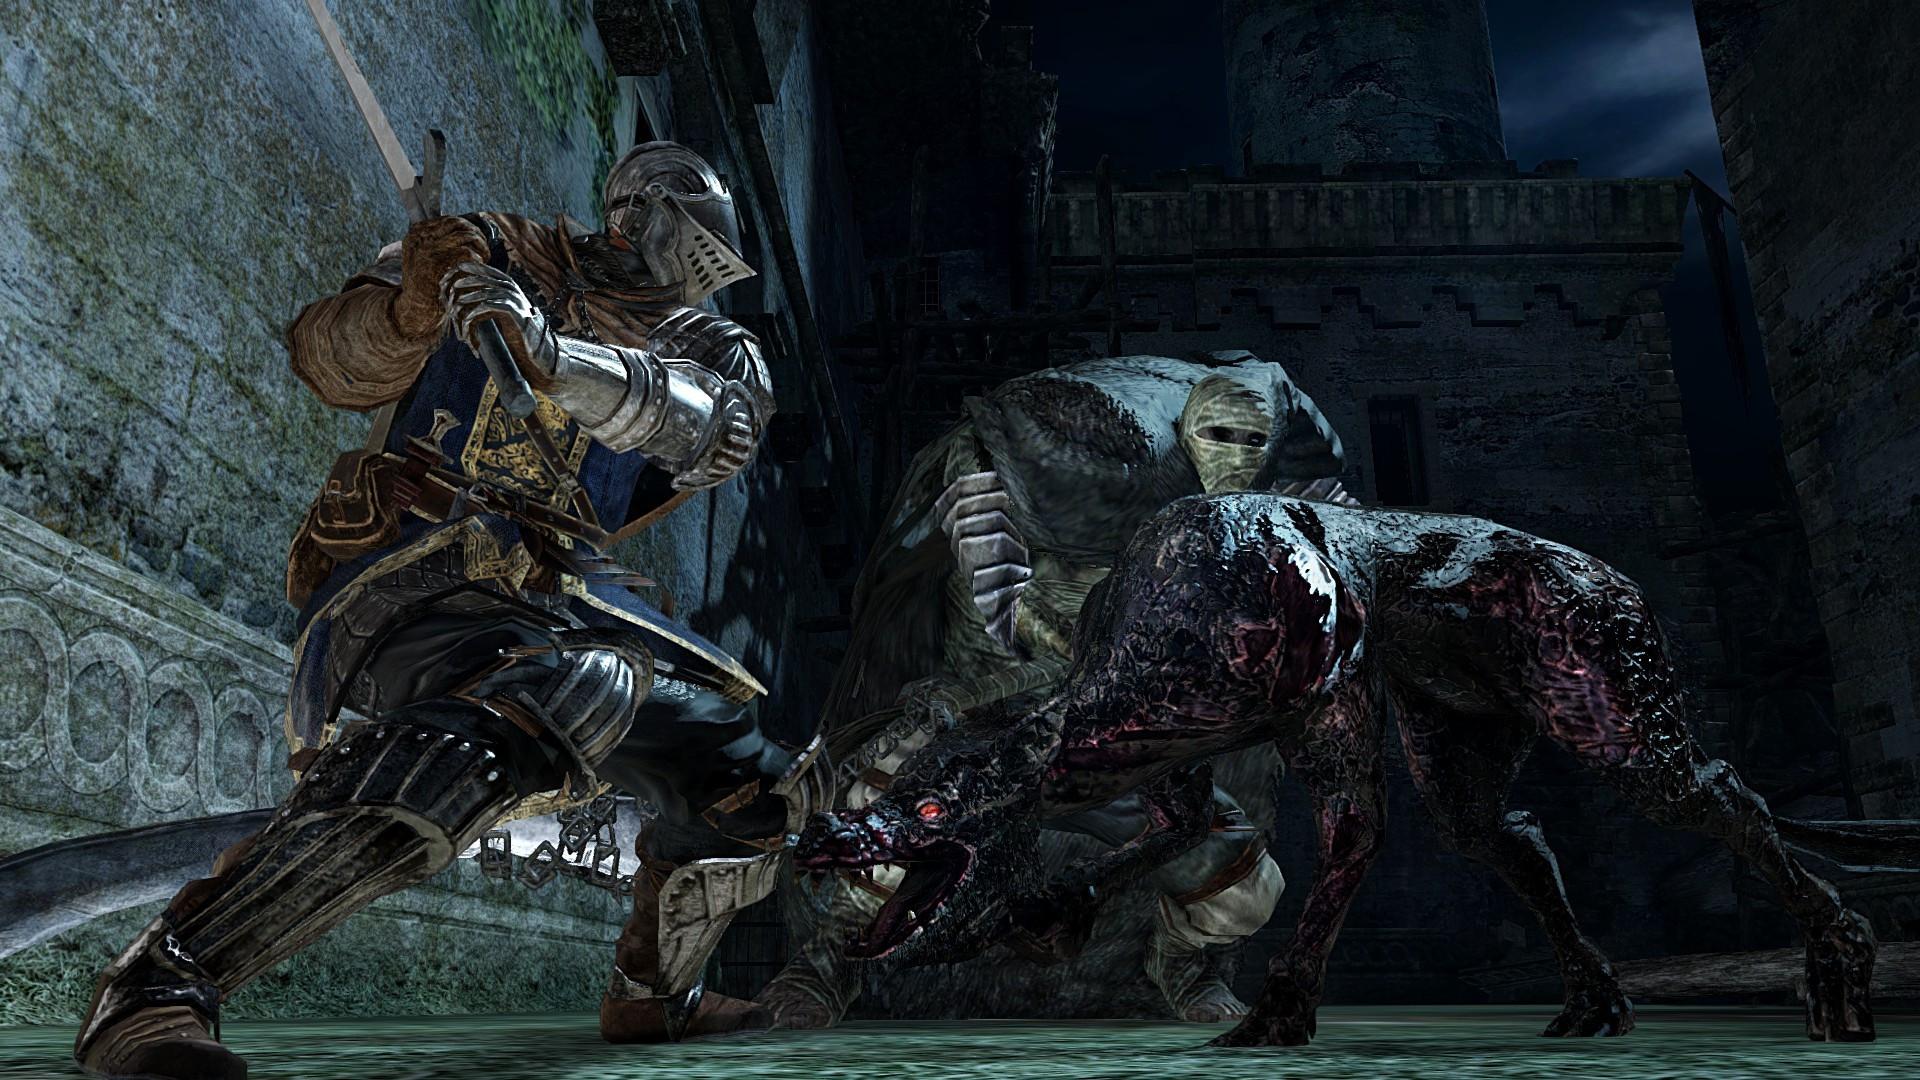 Dark Souls Ii: Dark Souls III Promotional Pamphlet Surfaces Online